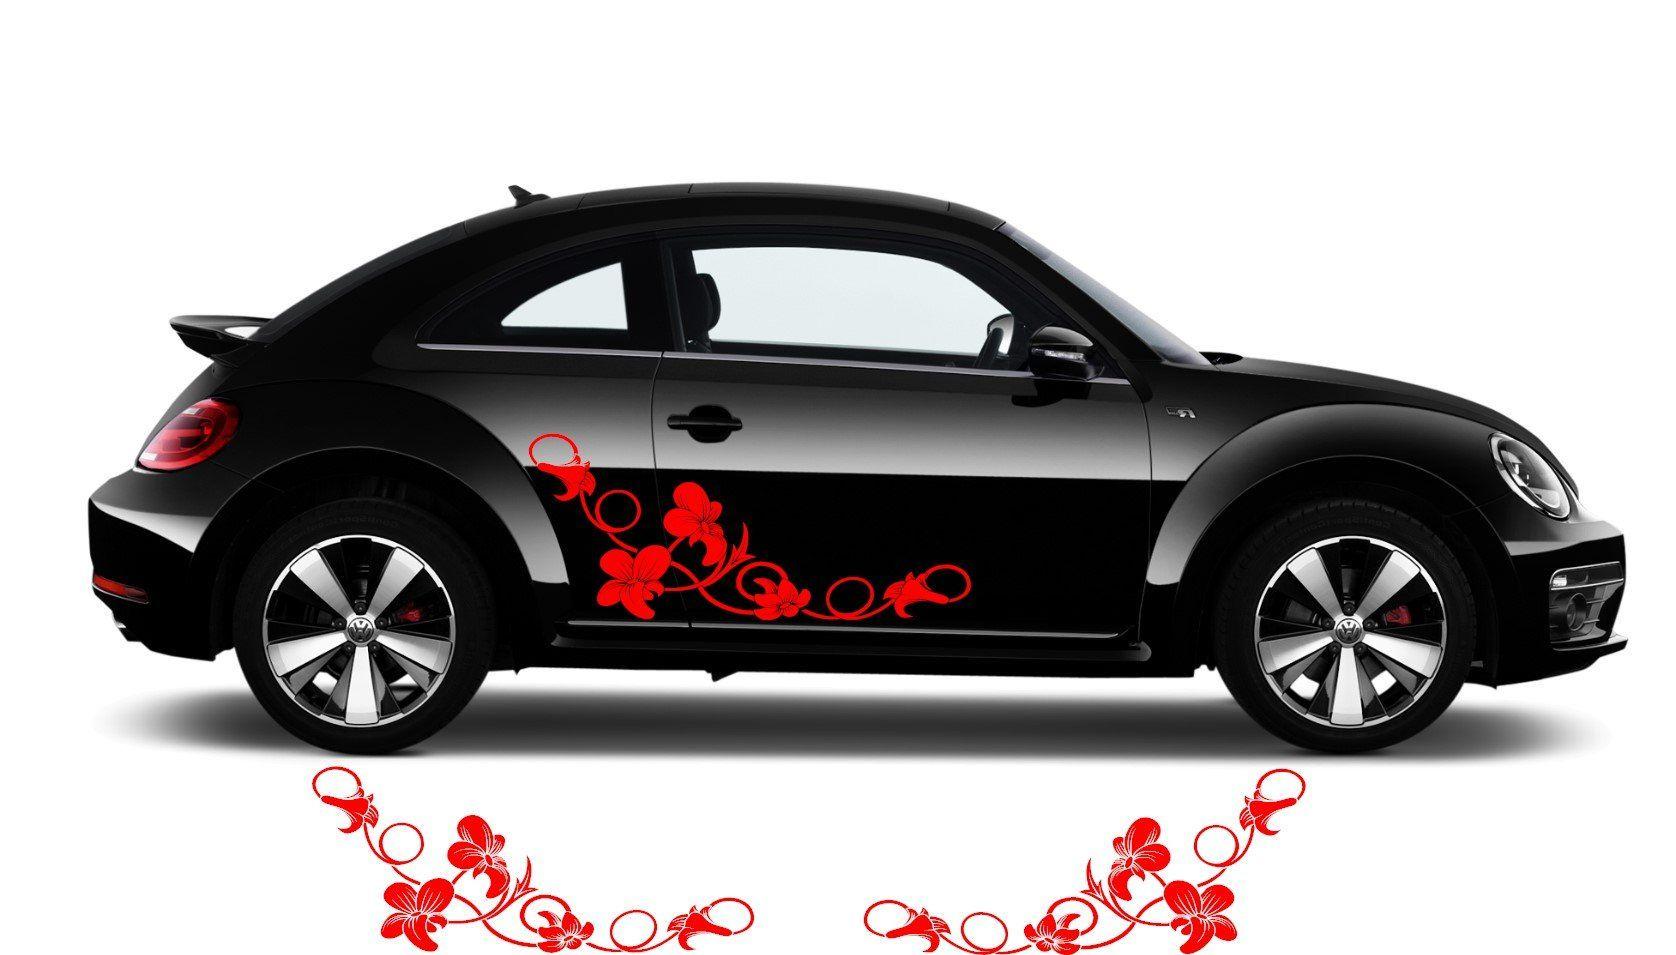 Floral Flower Swirl Car Decal Sticker Flower Car Decal 001 Etsy Auto Adesivos [ 955 x 1676 Pixel ]